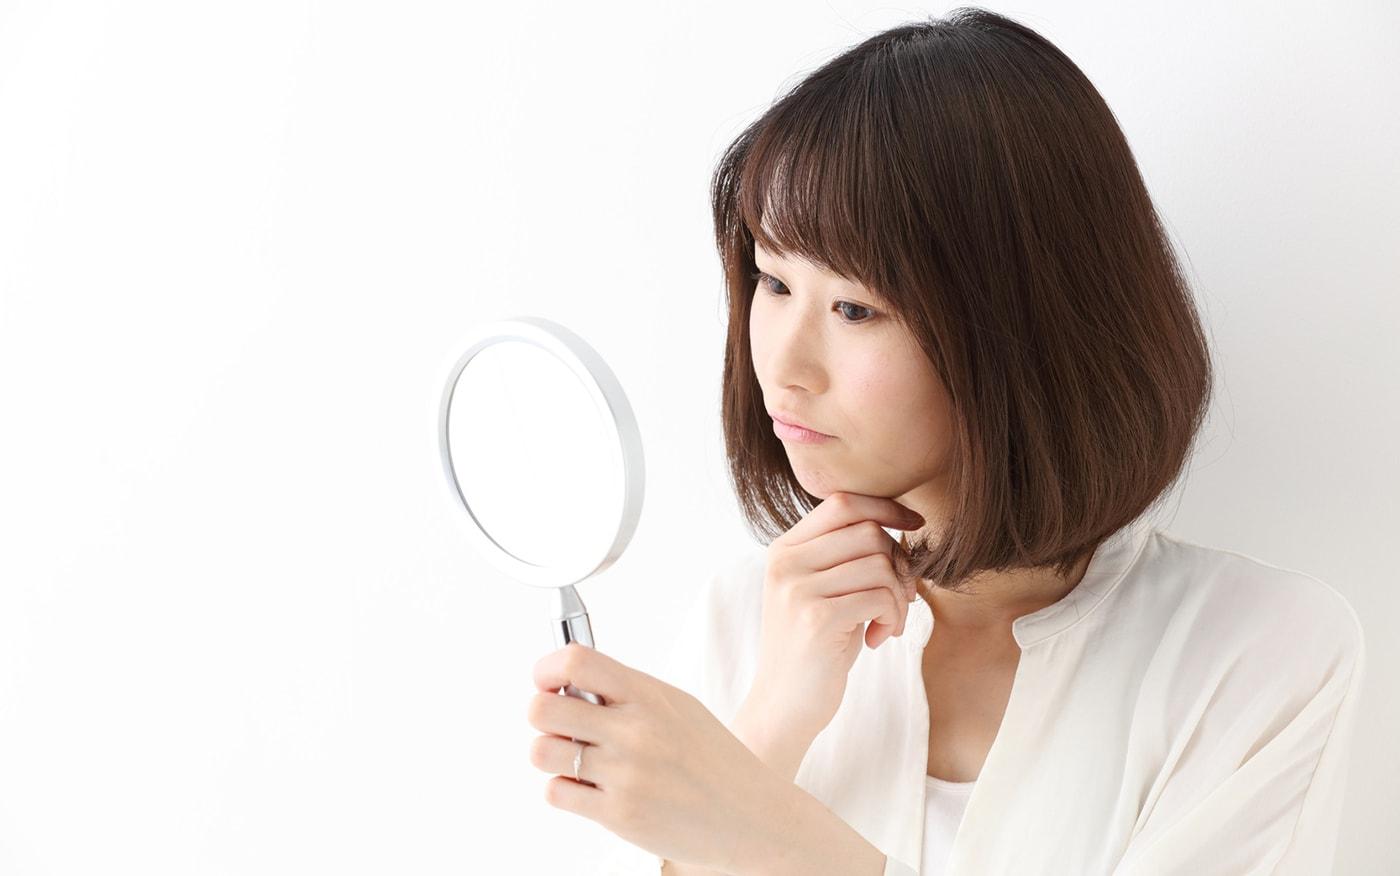 HIFU痩身・小顔 トータルビューティーサロン Angelica(アンジェリカ)